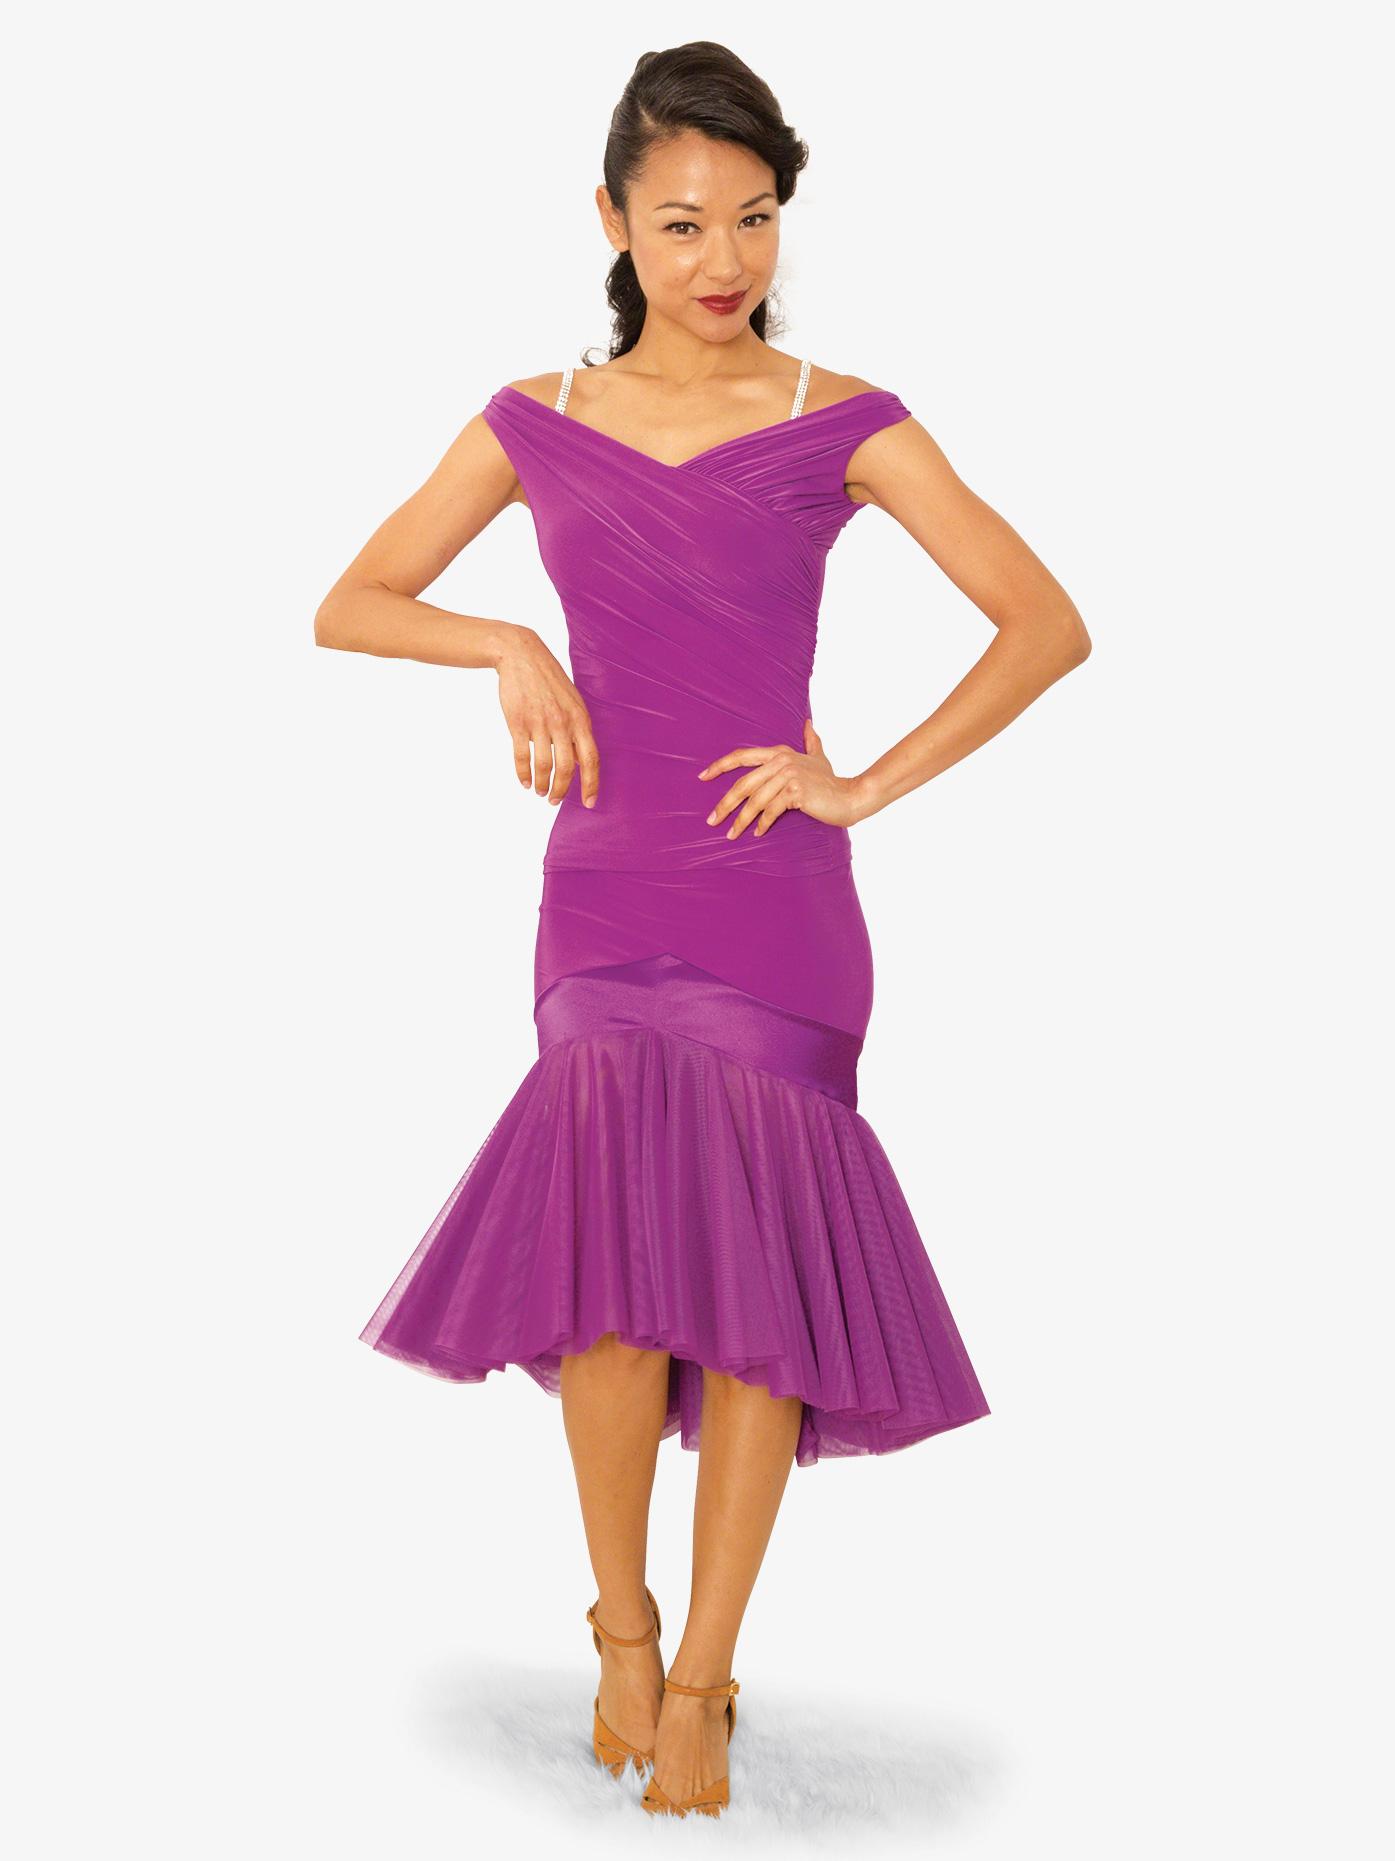 Dance America Womens Vida De Samba Ballroom Dance Skirt S820